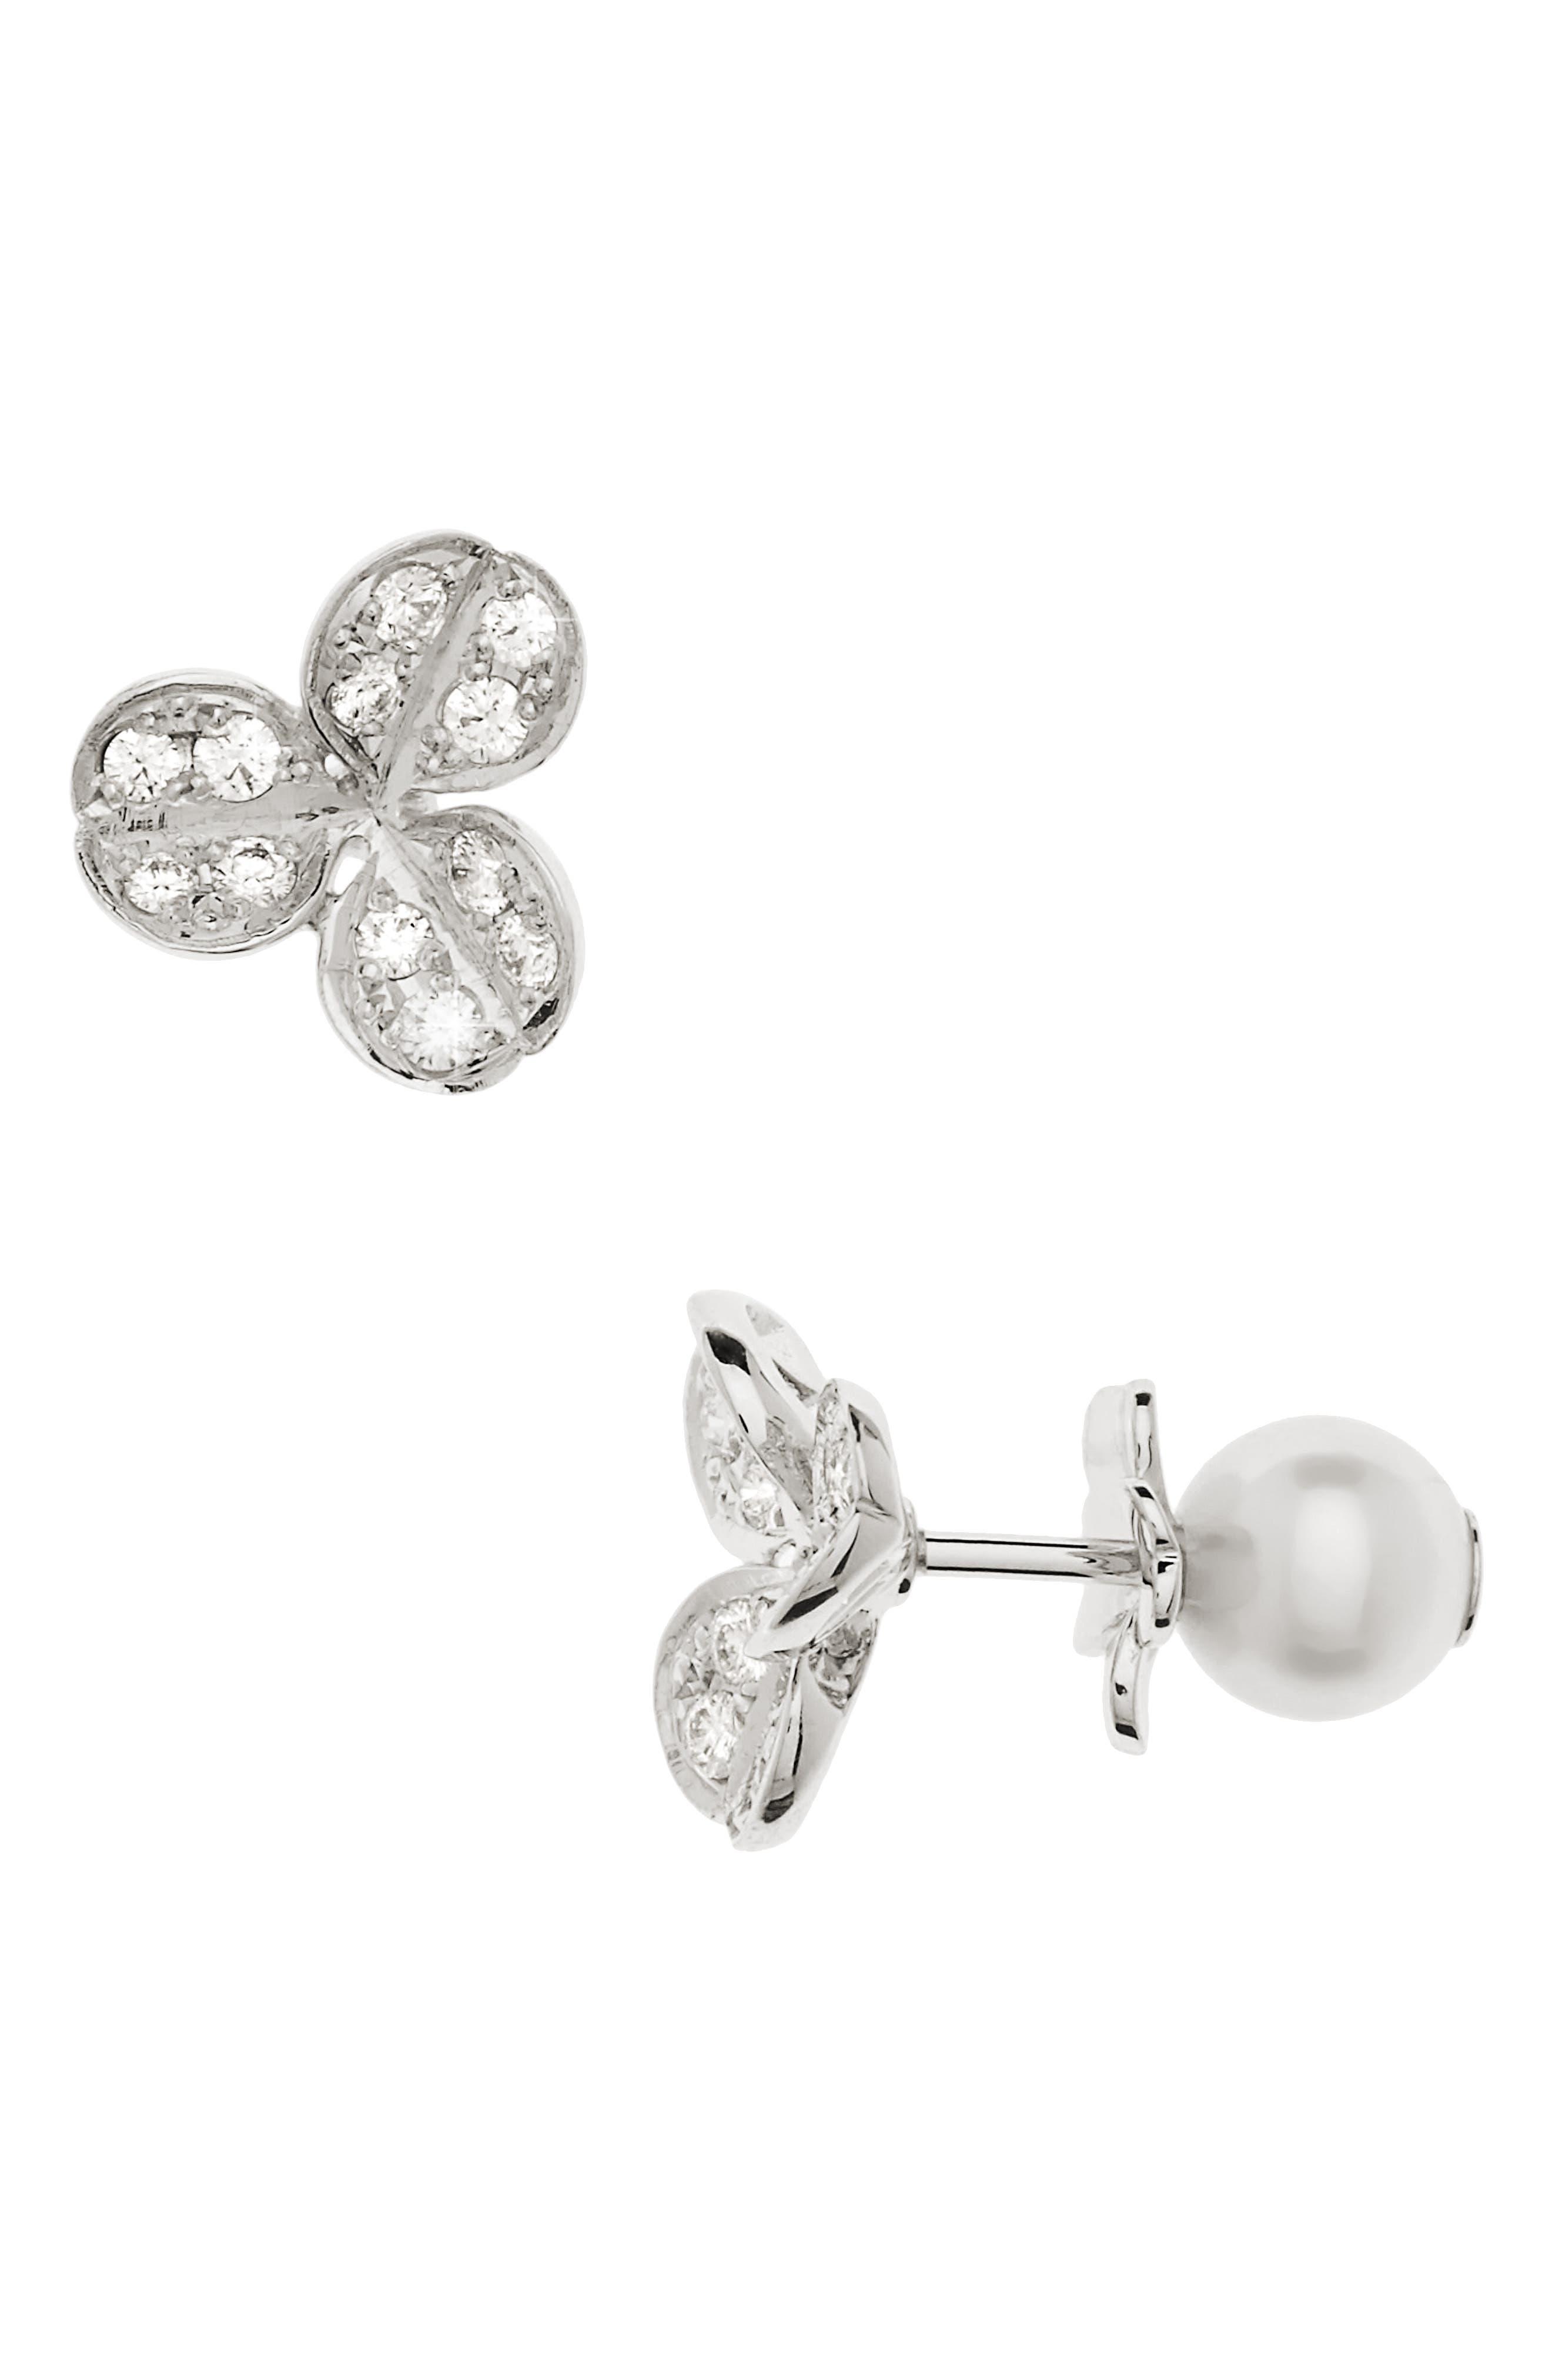 Main Image - Mikimoto Pearl & Diamond Front/Back Earrings